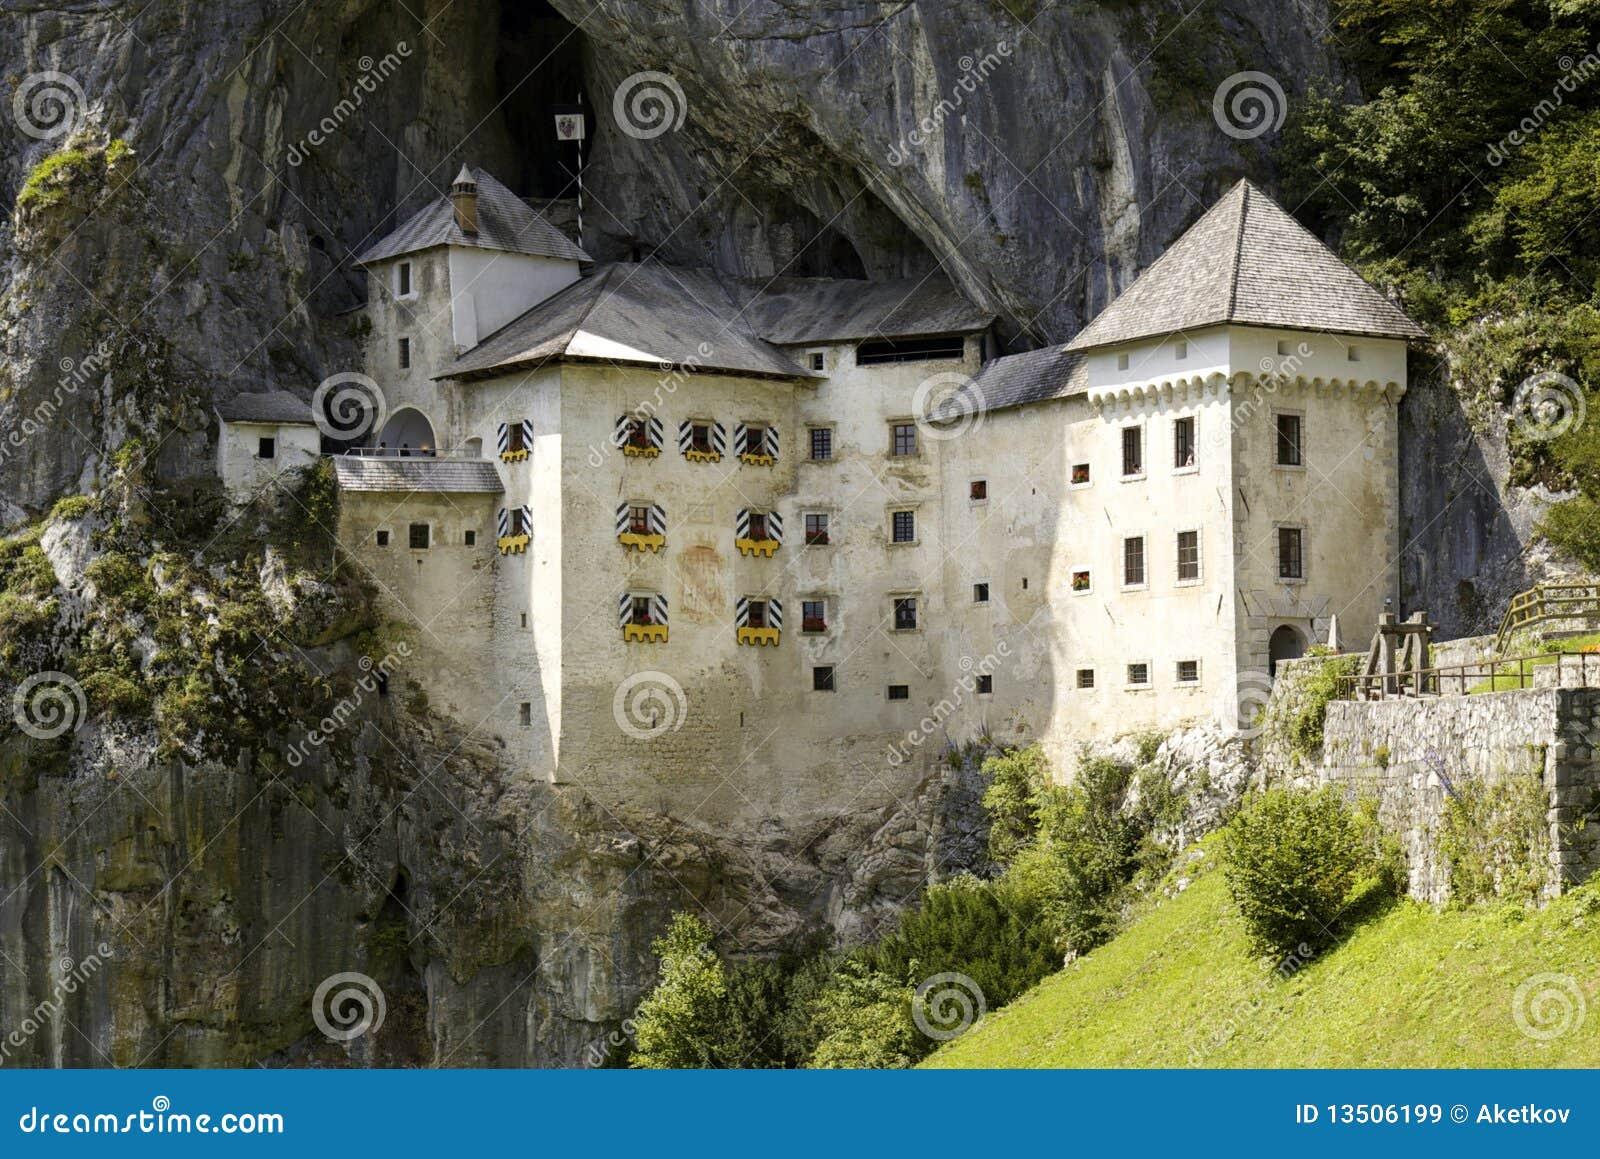 Robber castle